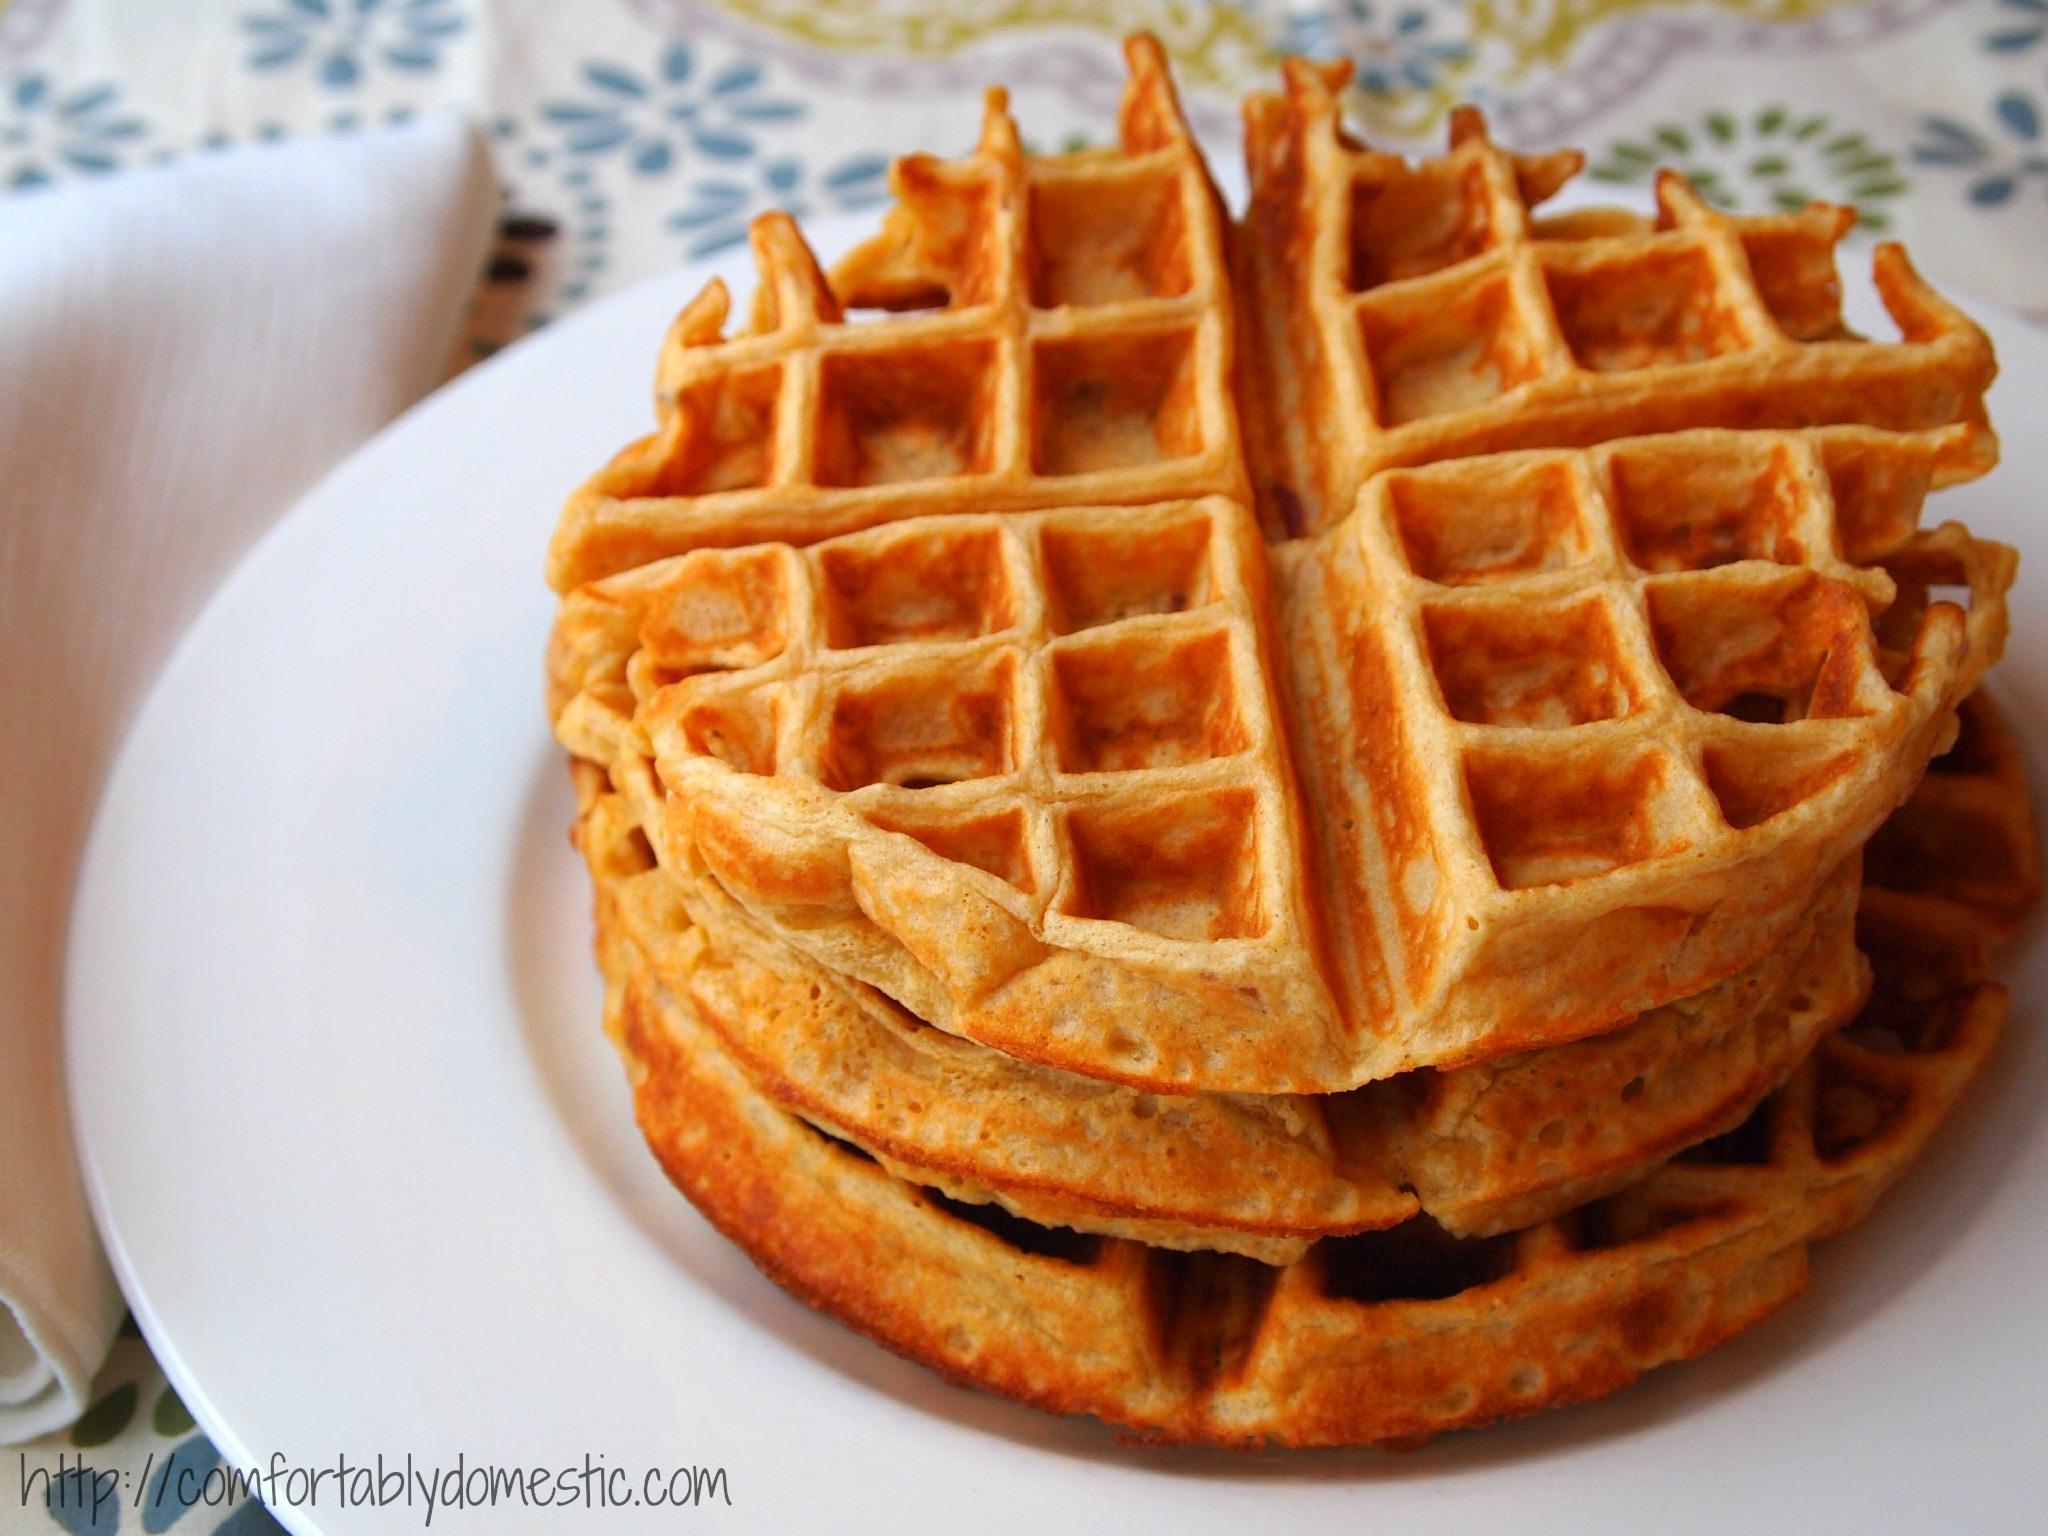 Whole Wheat Maple Bacon Waffles | Recipe on ComfortablyDomestic.com